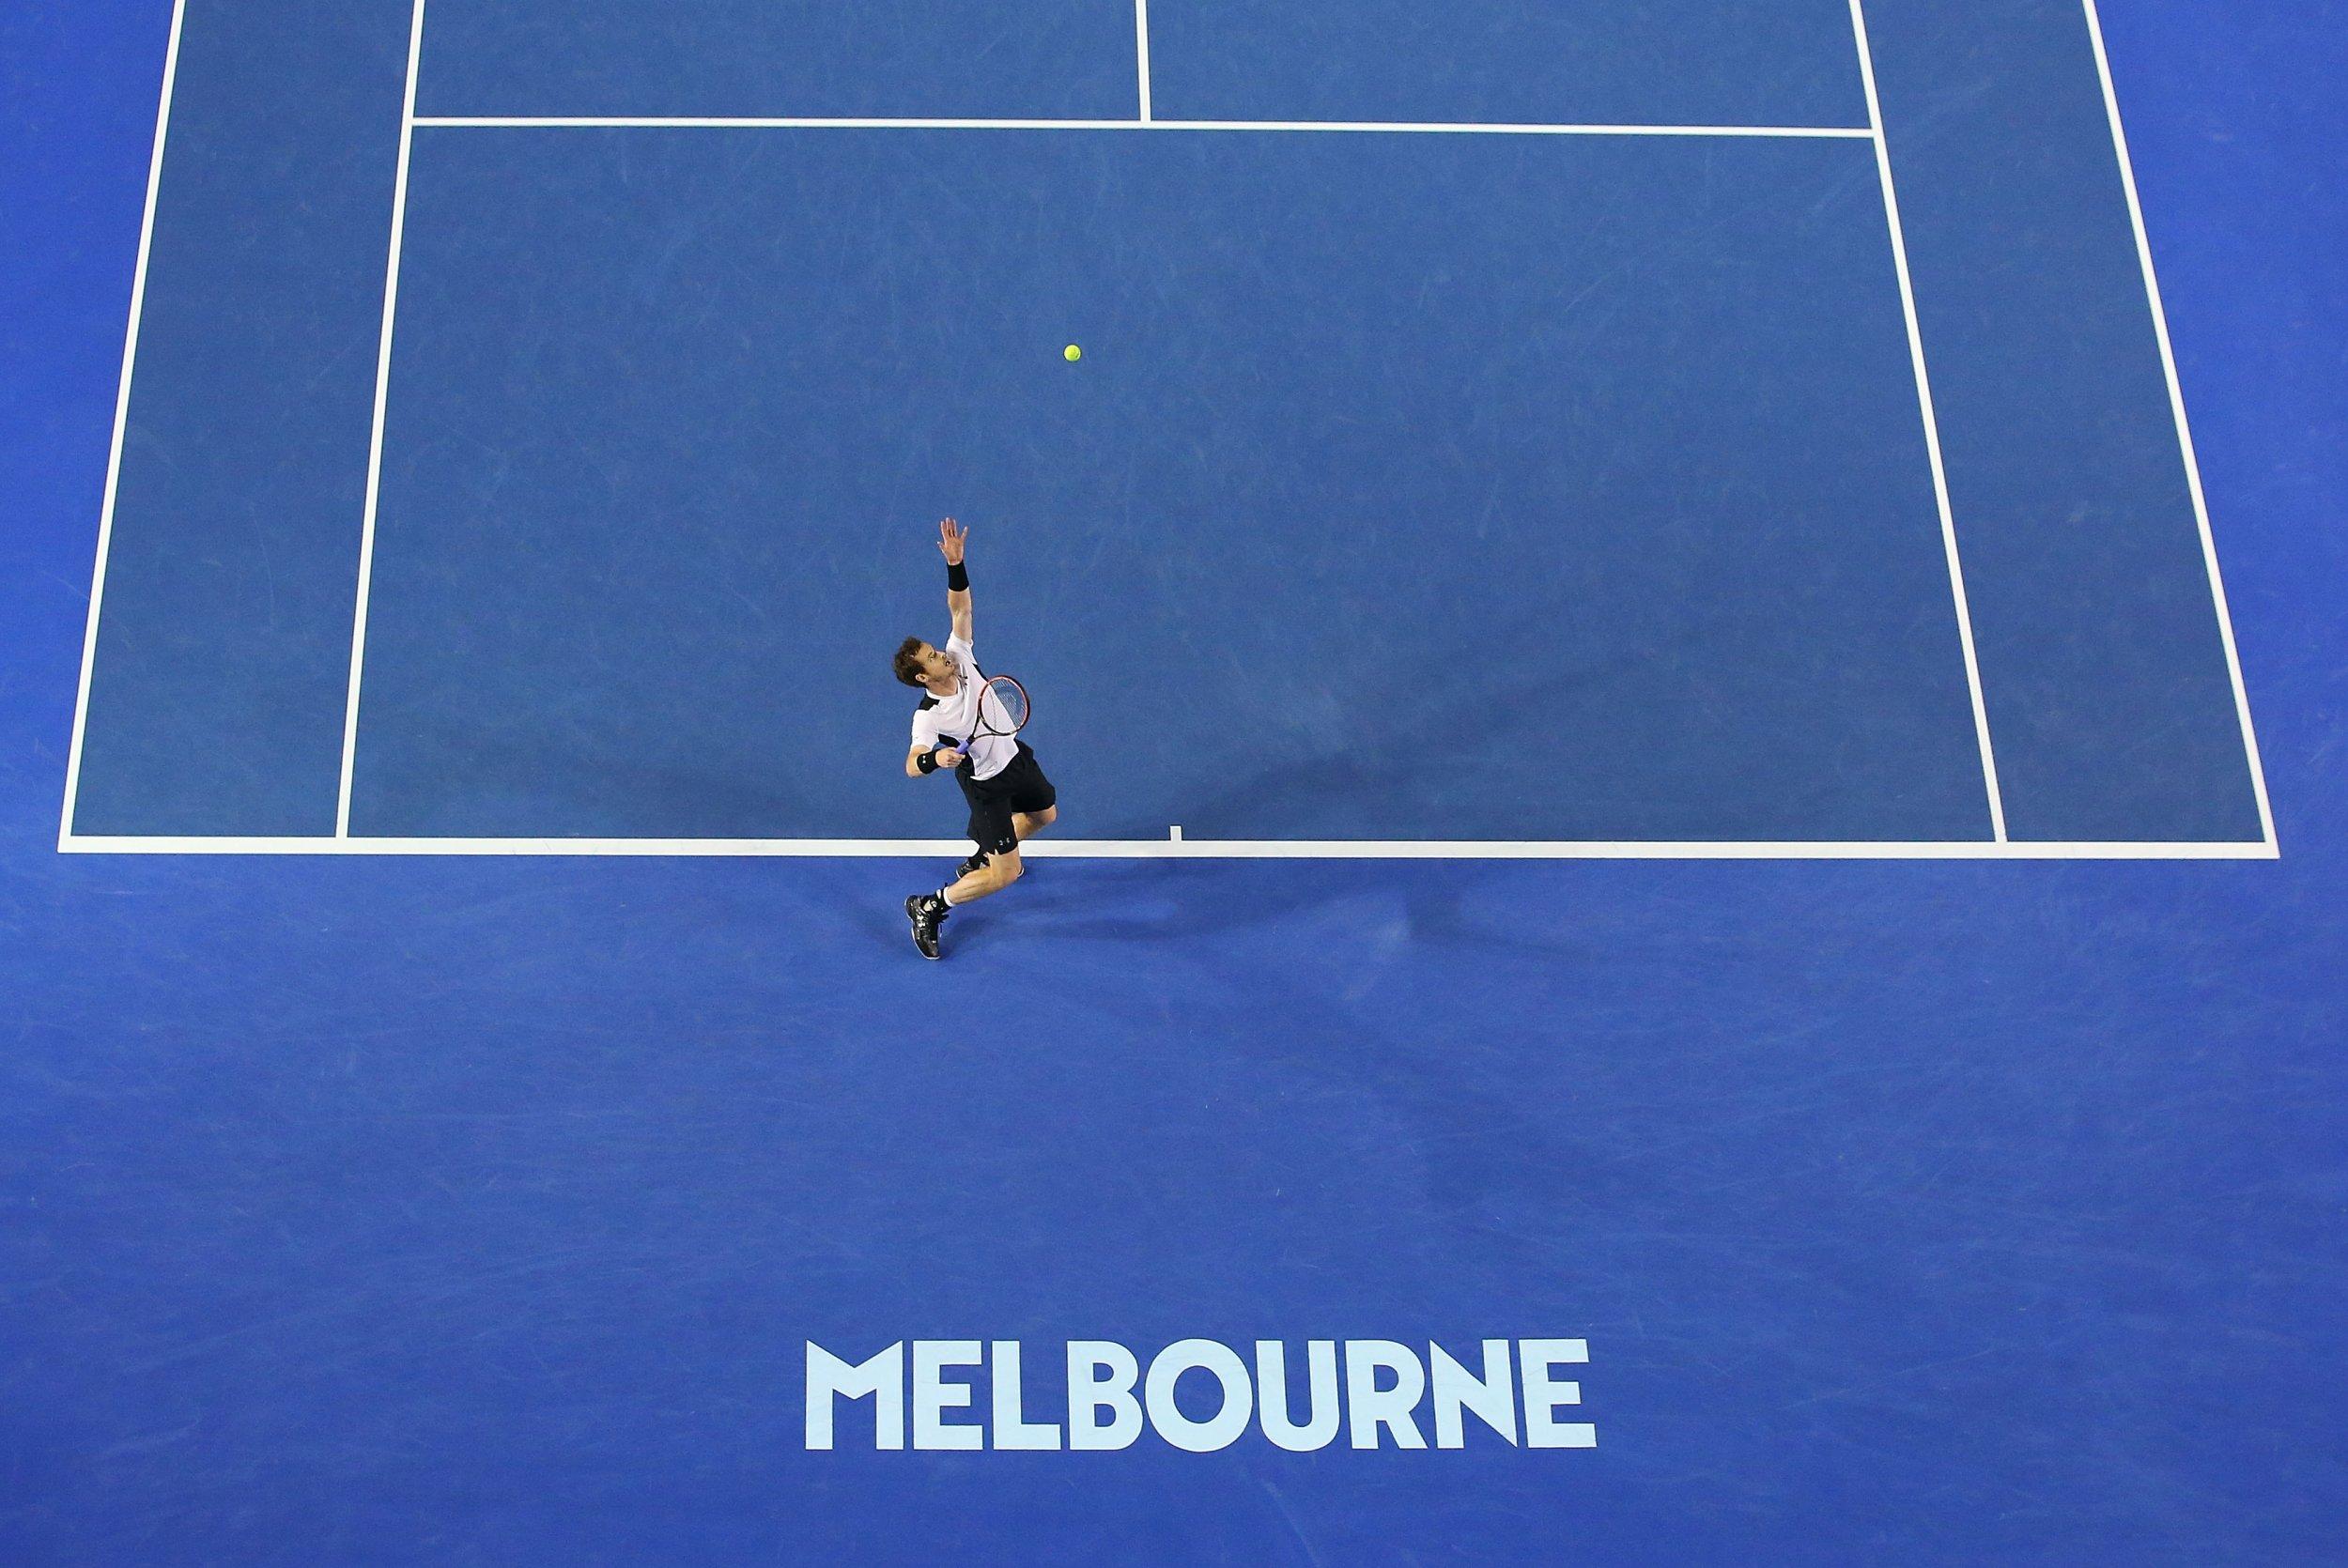 Andy Murray will face Novak Djokovic in the Australian Open final.